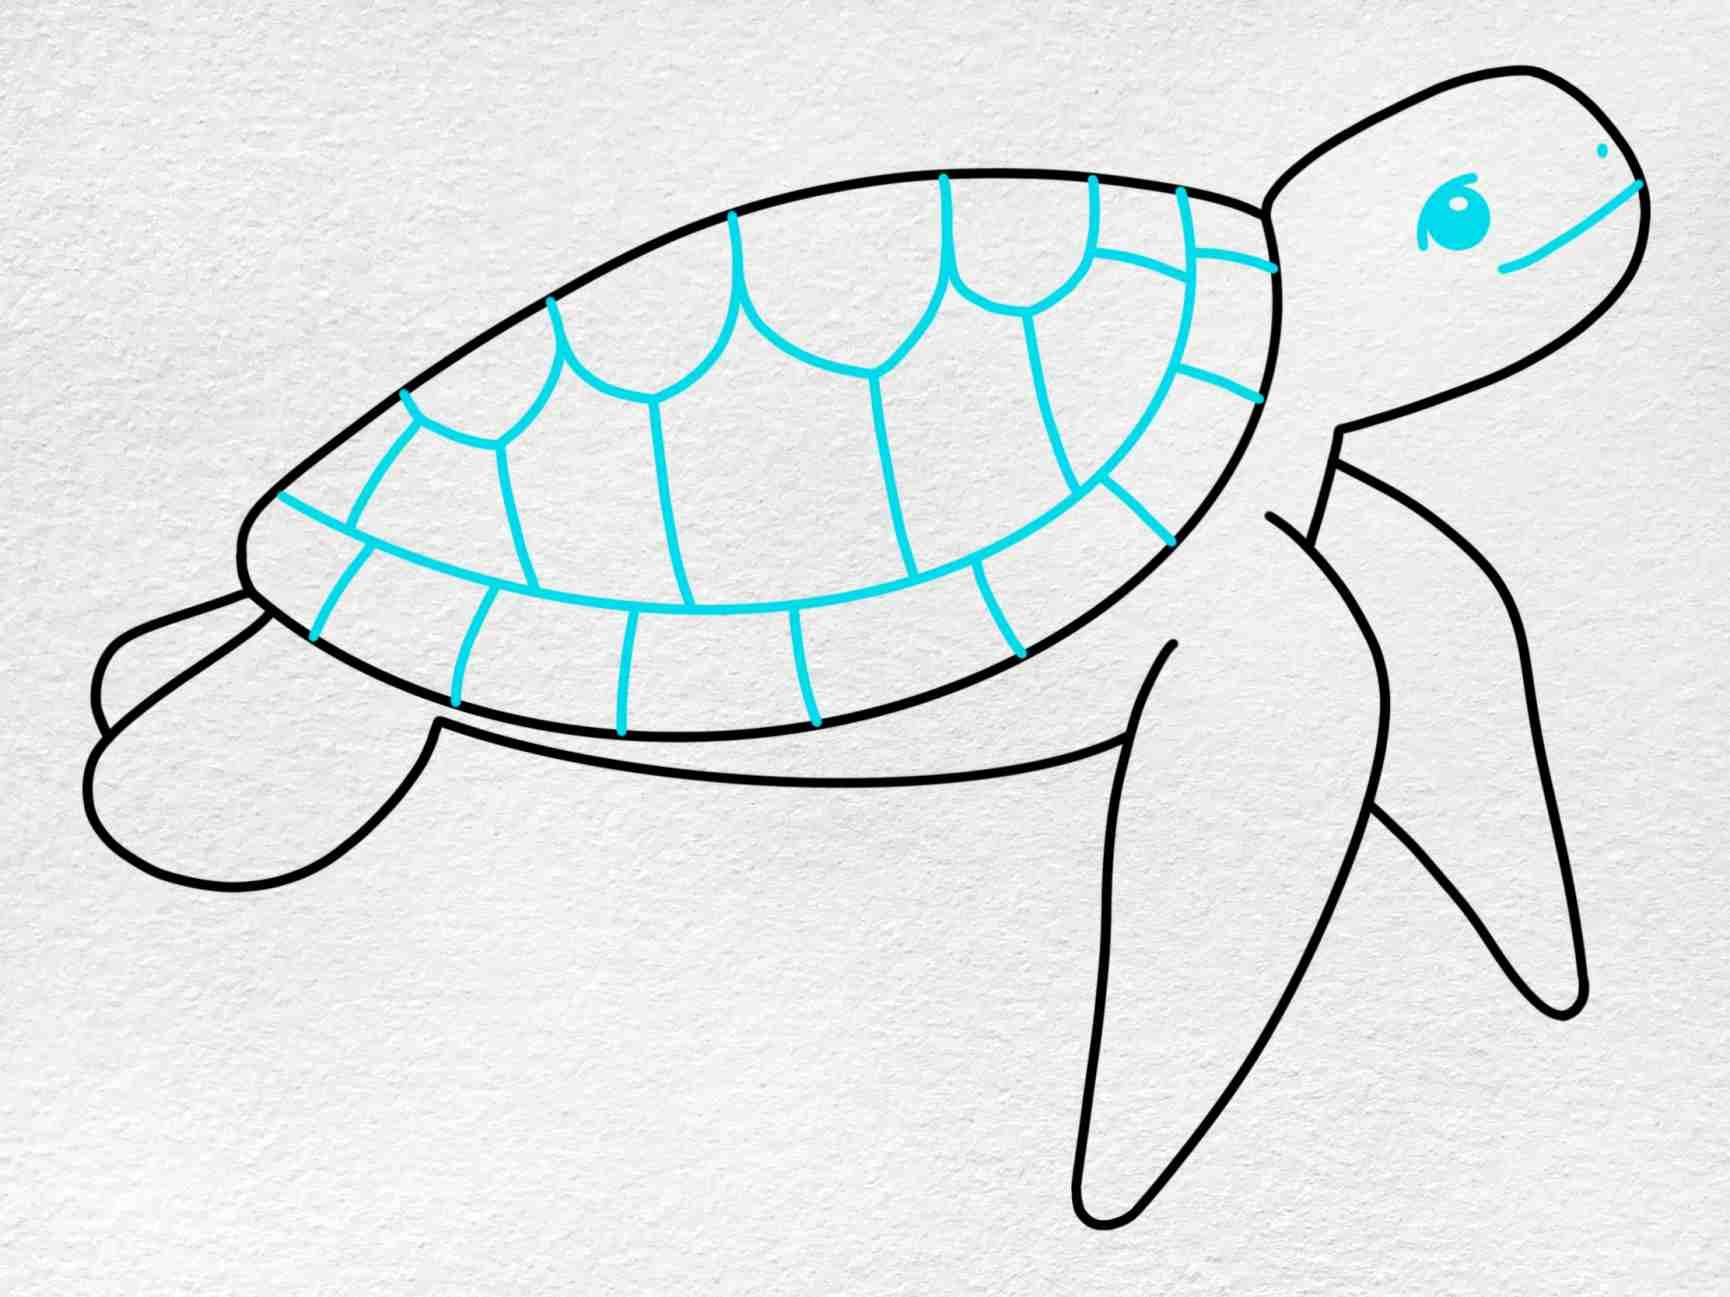 Sea Turtle Drawing Easy: Step 5